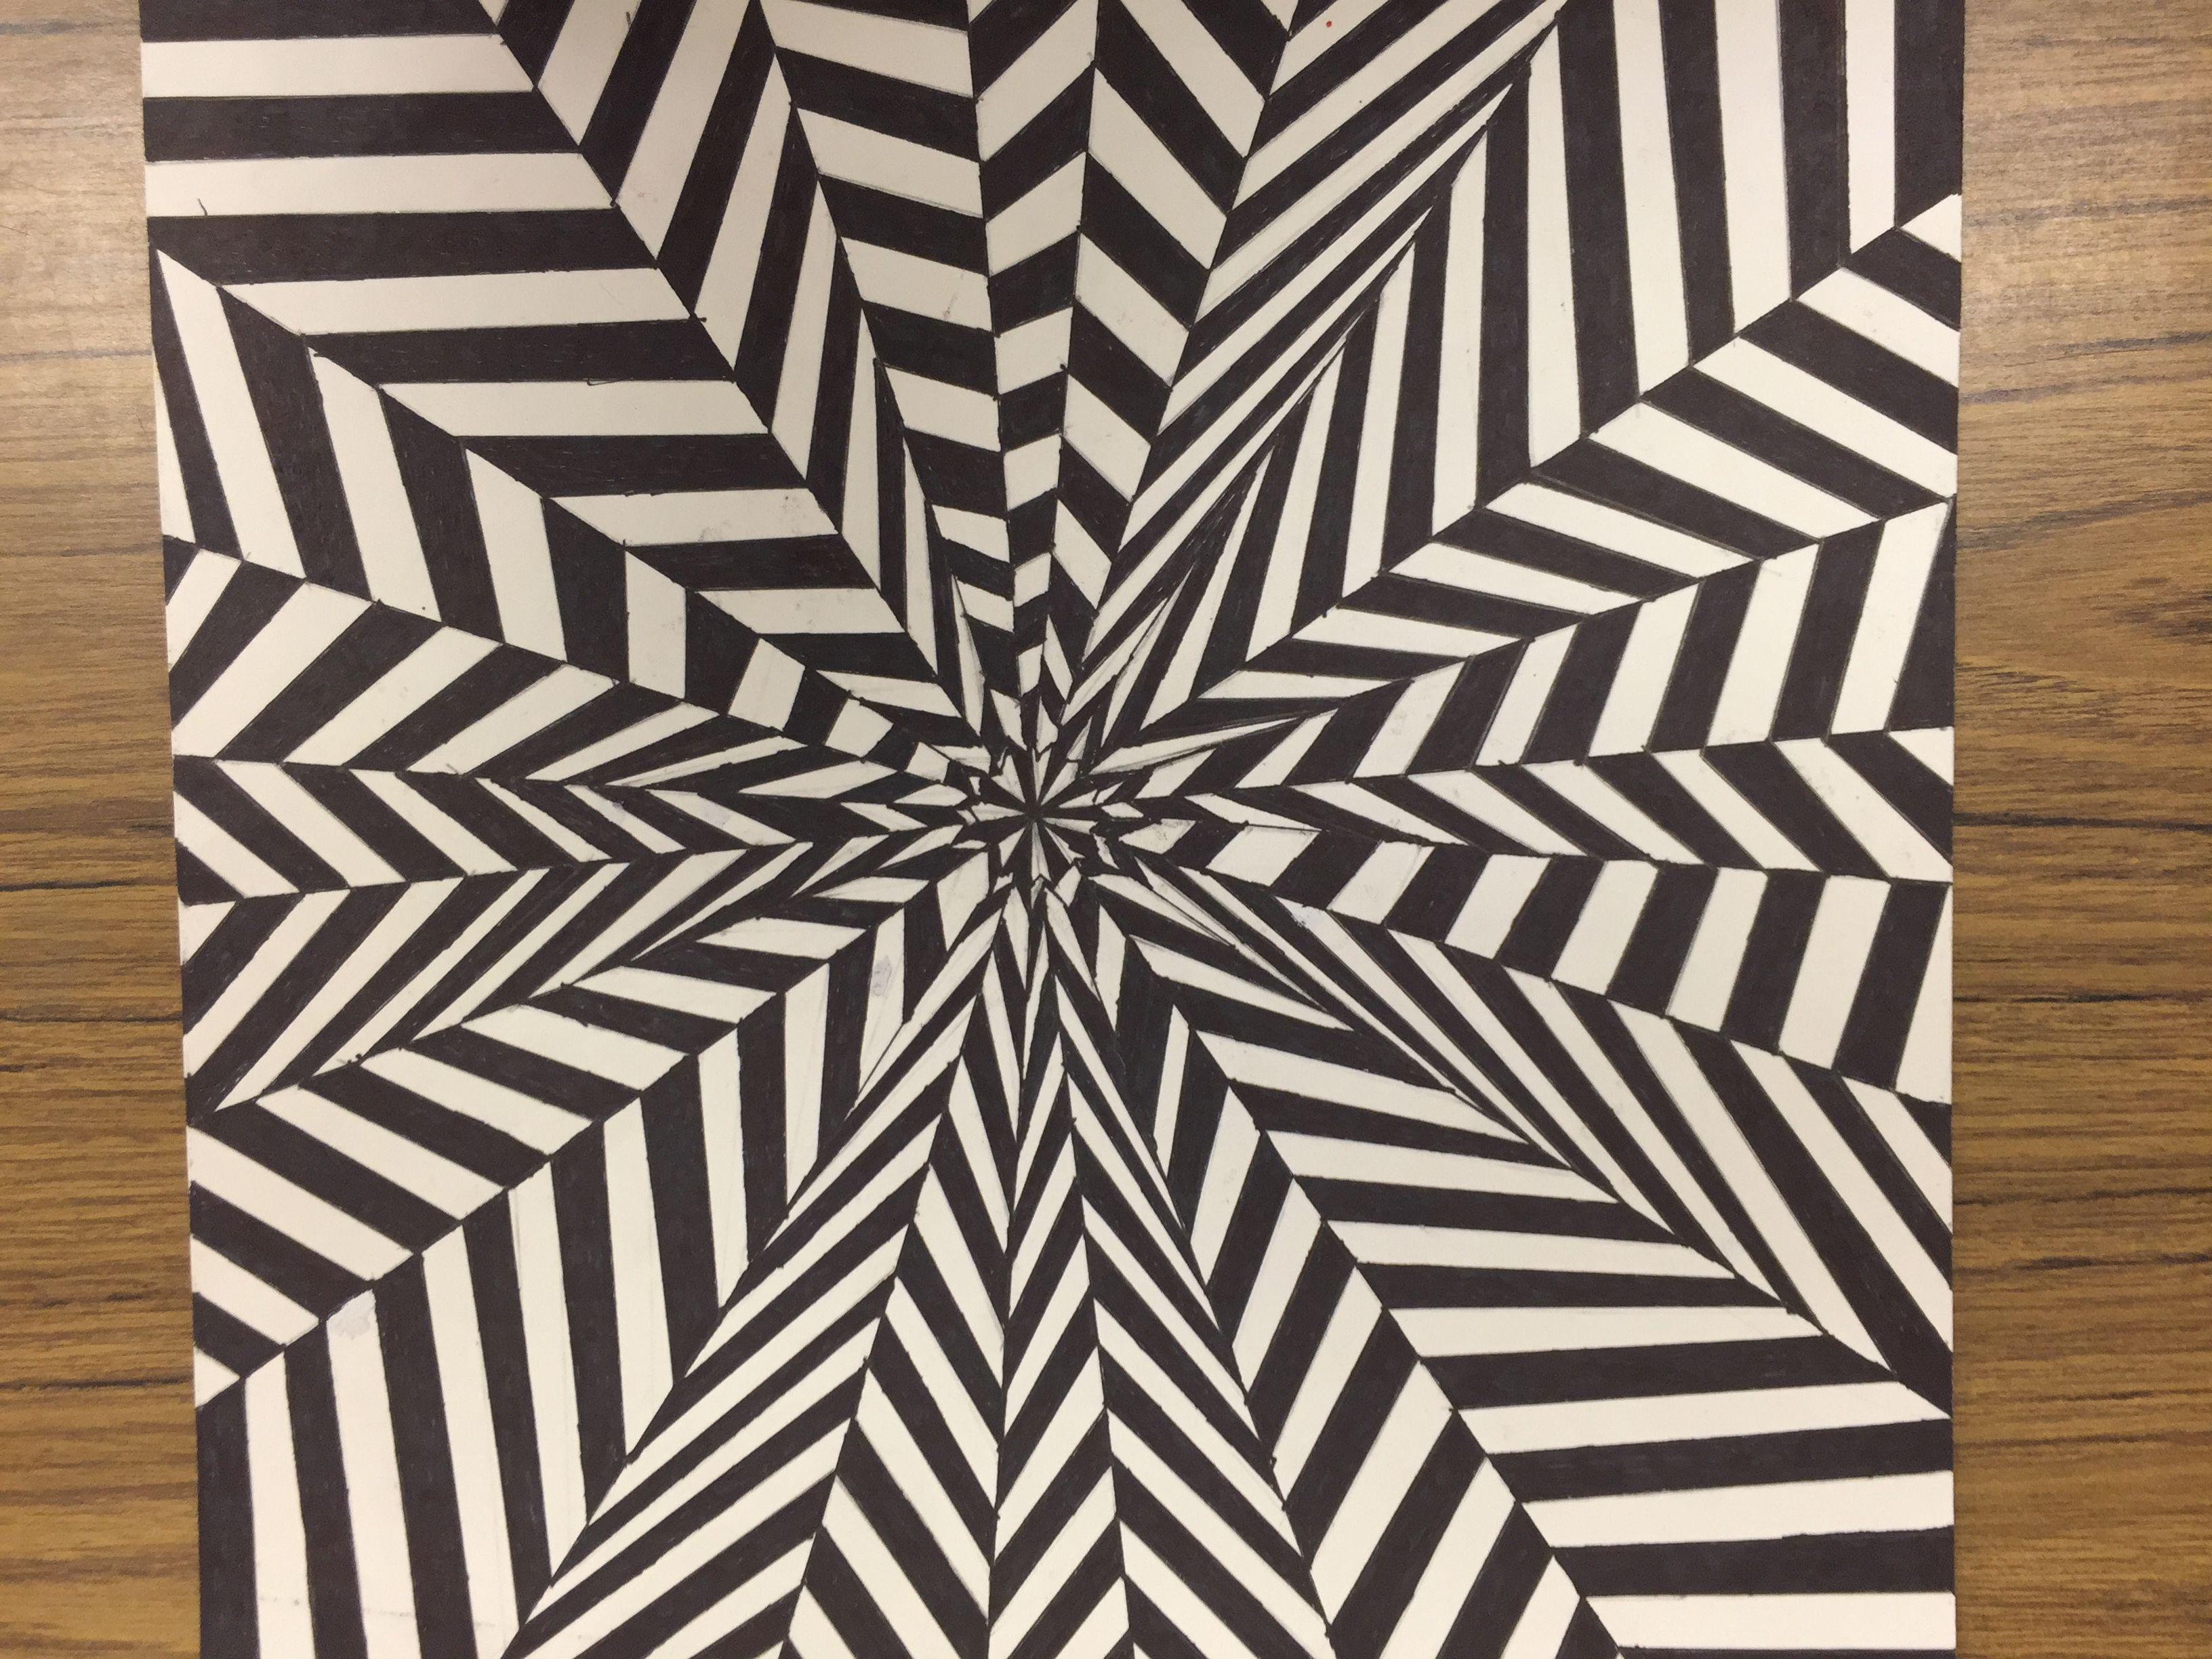 Pin By Tracy Workman On School Art